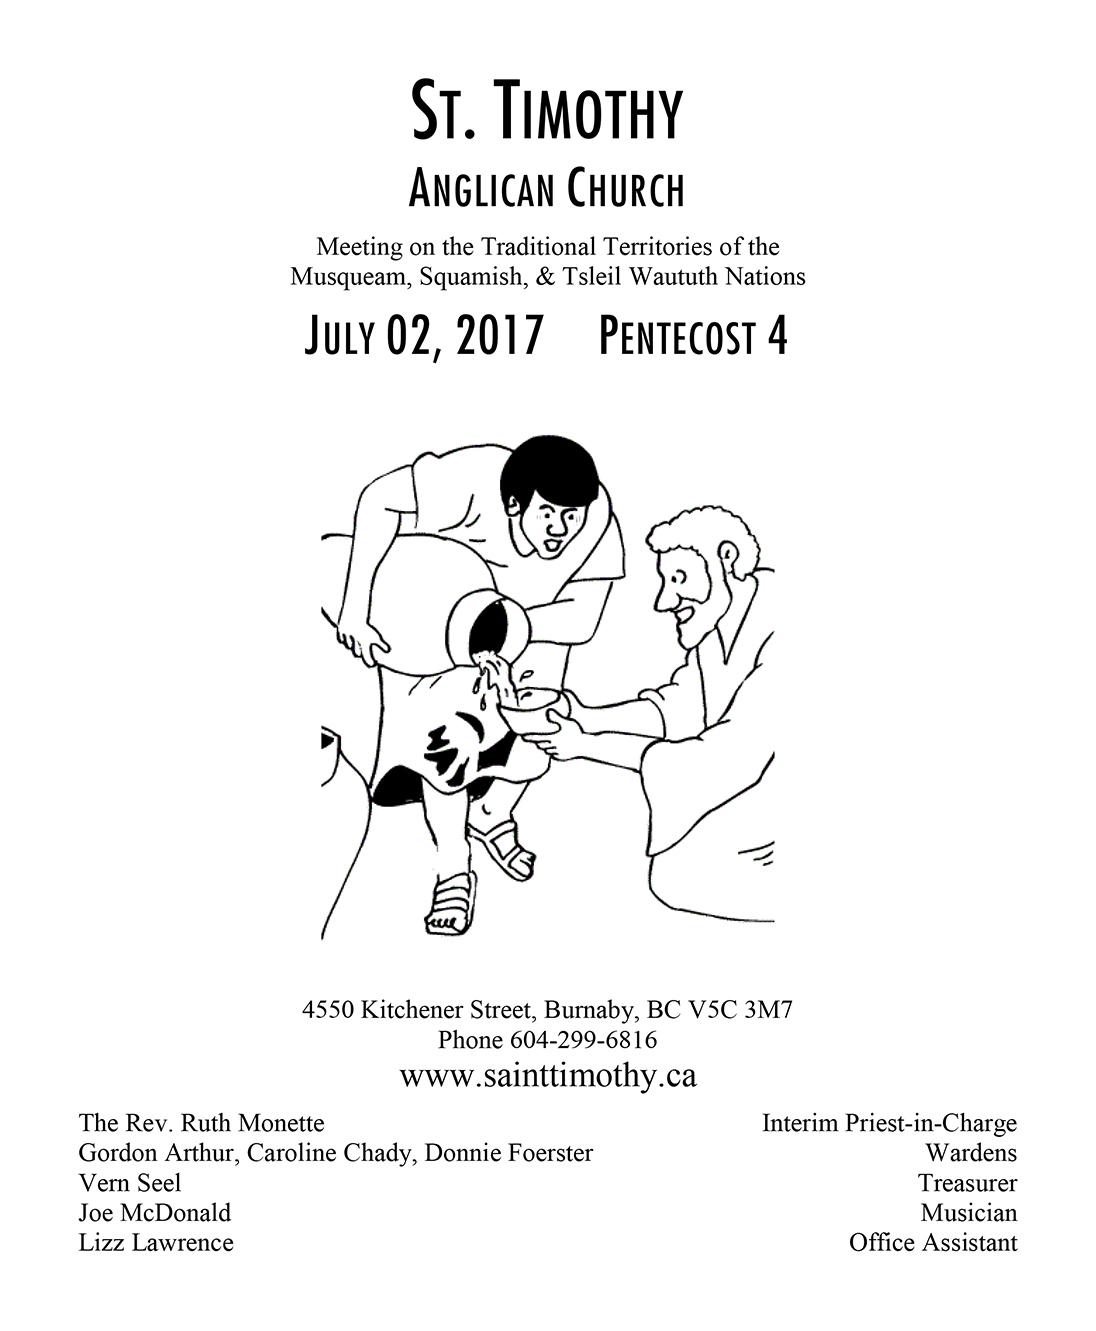 Bulletin: July 2, 2017